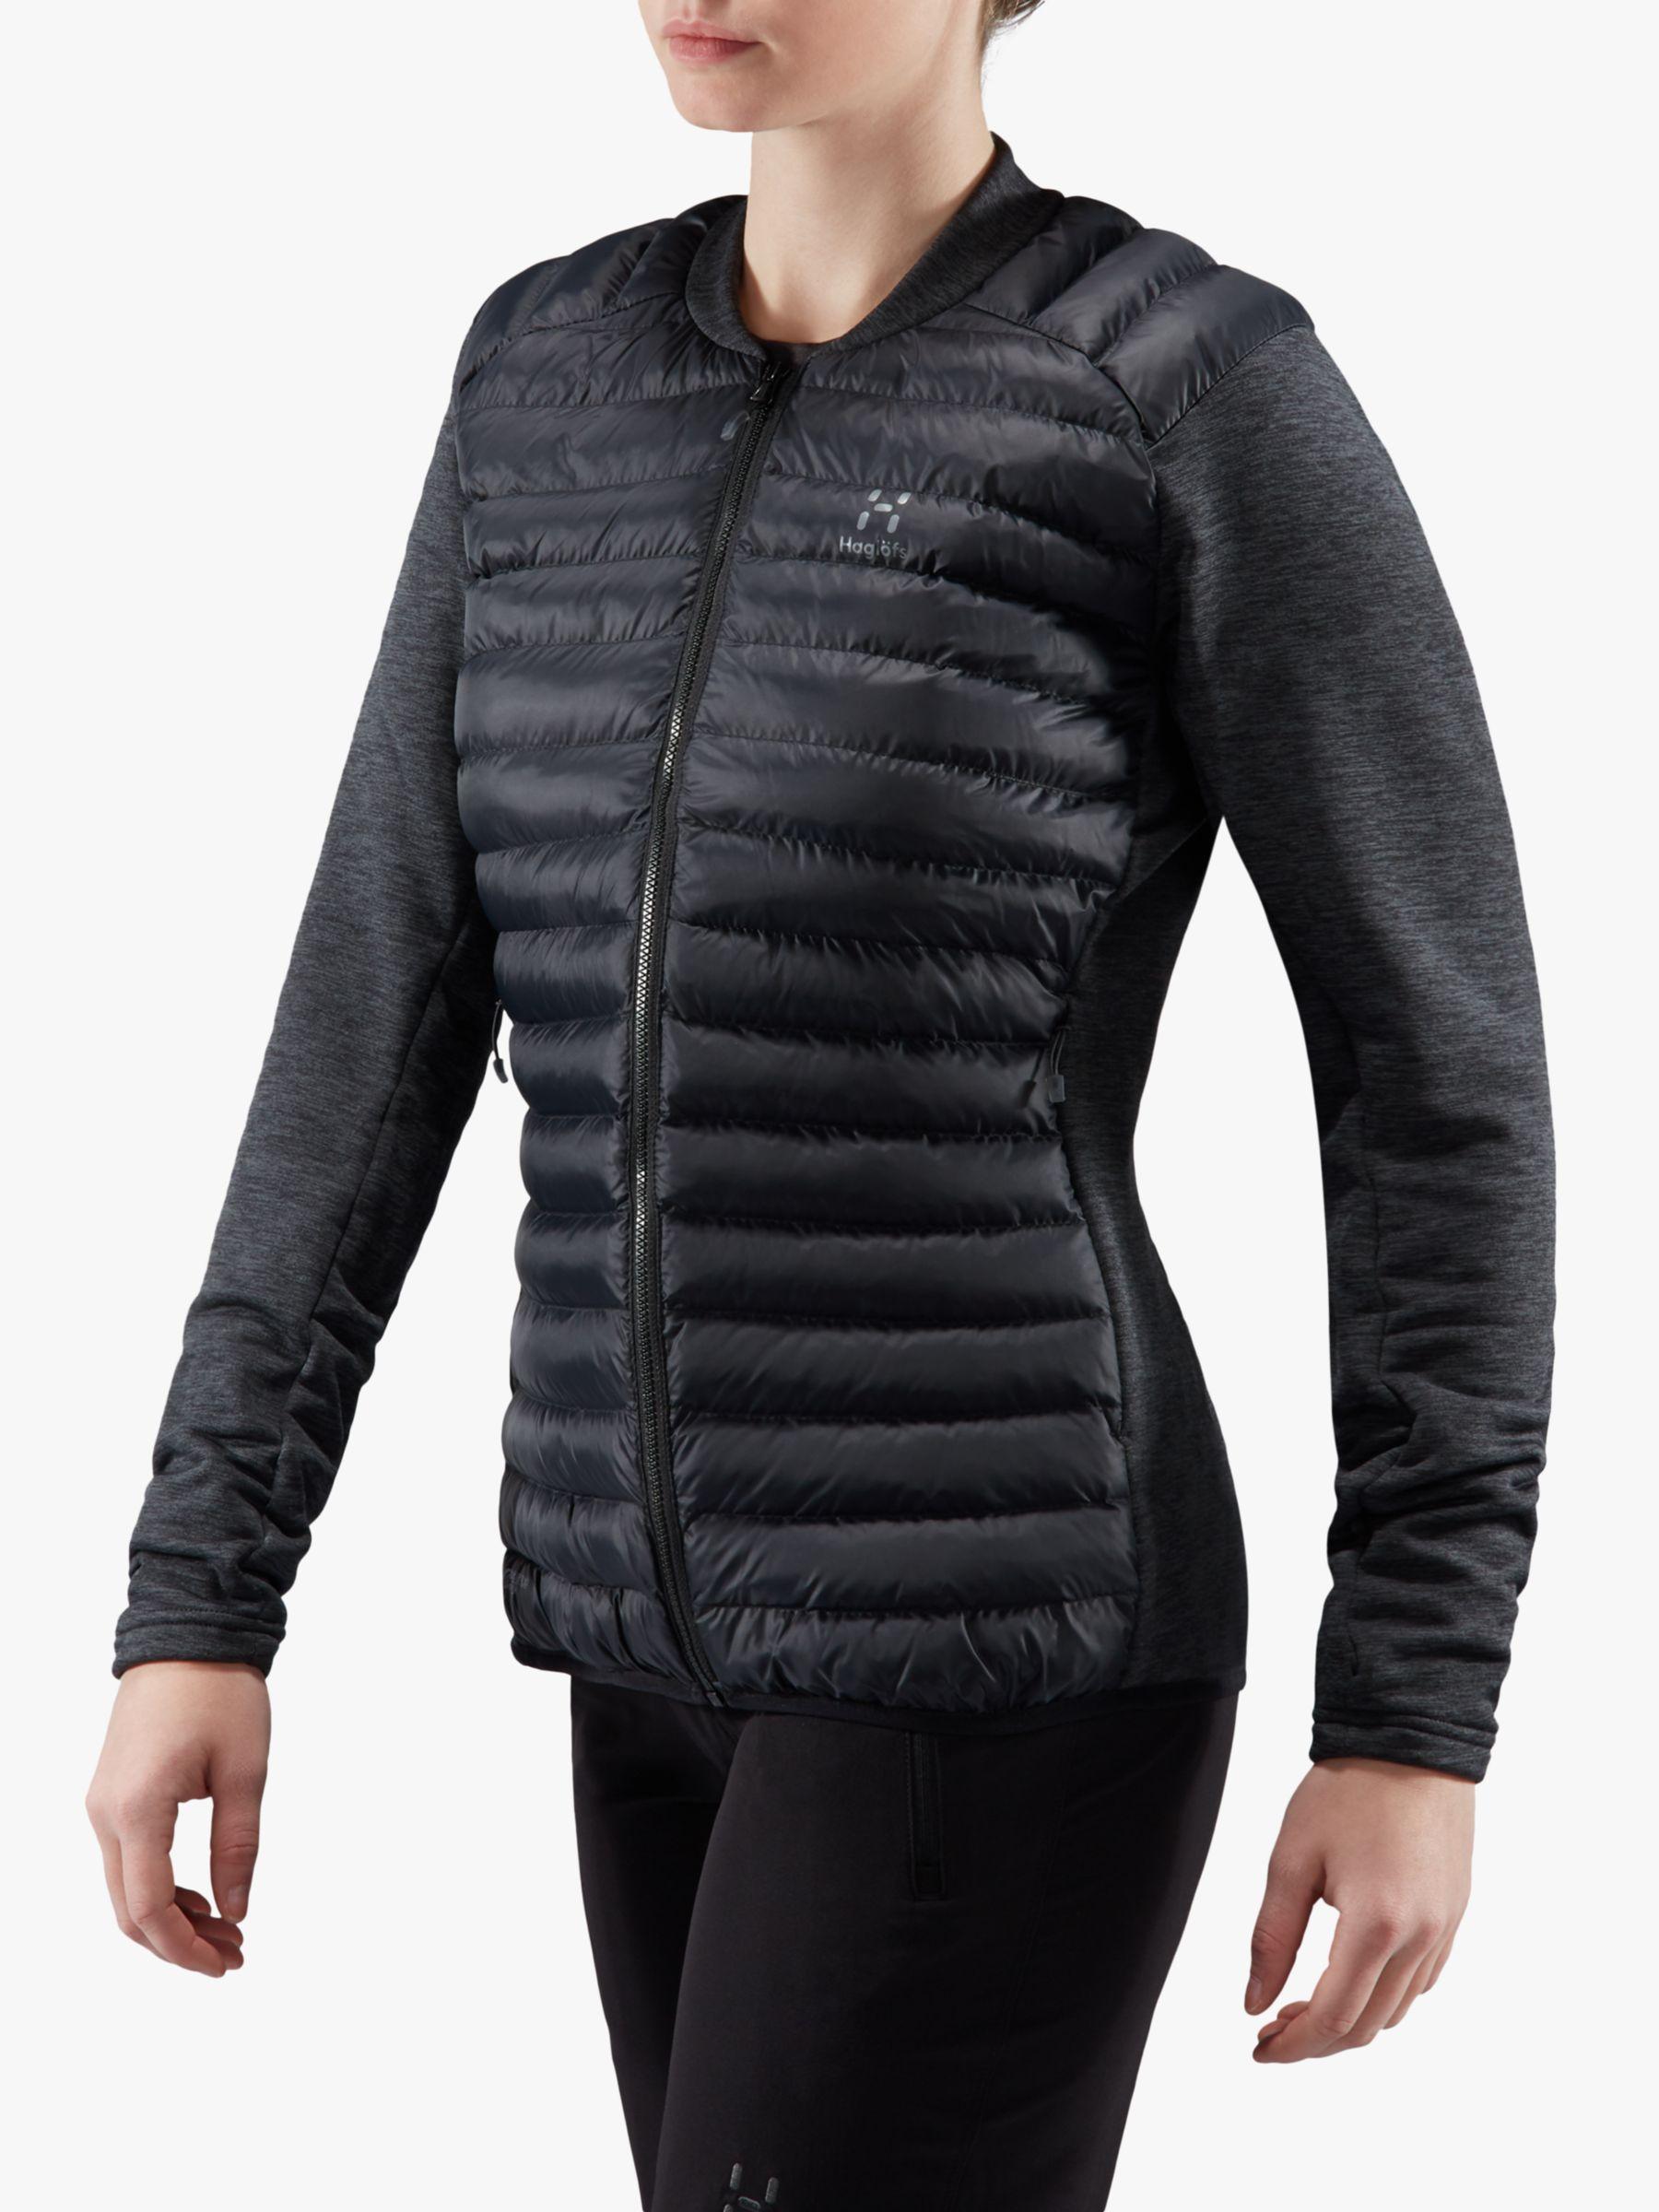 Haglofs Haglöfs Mimic Hybrid Women's Insulated Jacket, True Black/Magnetite